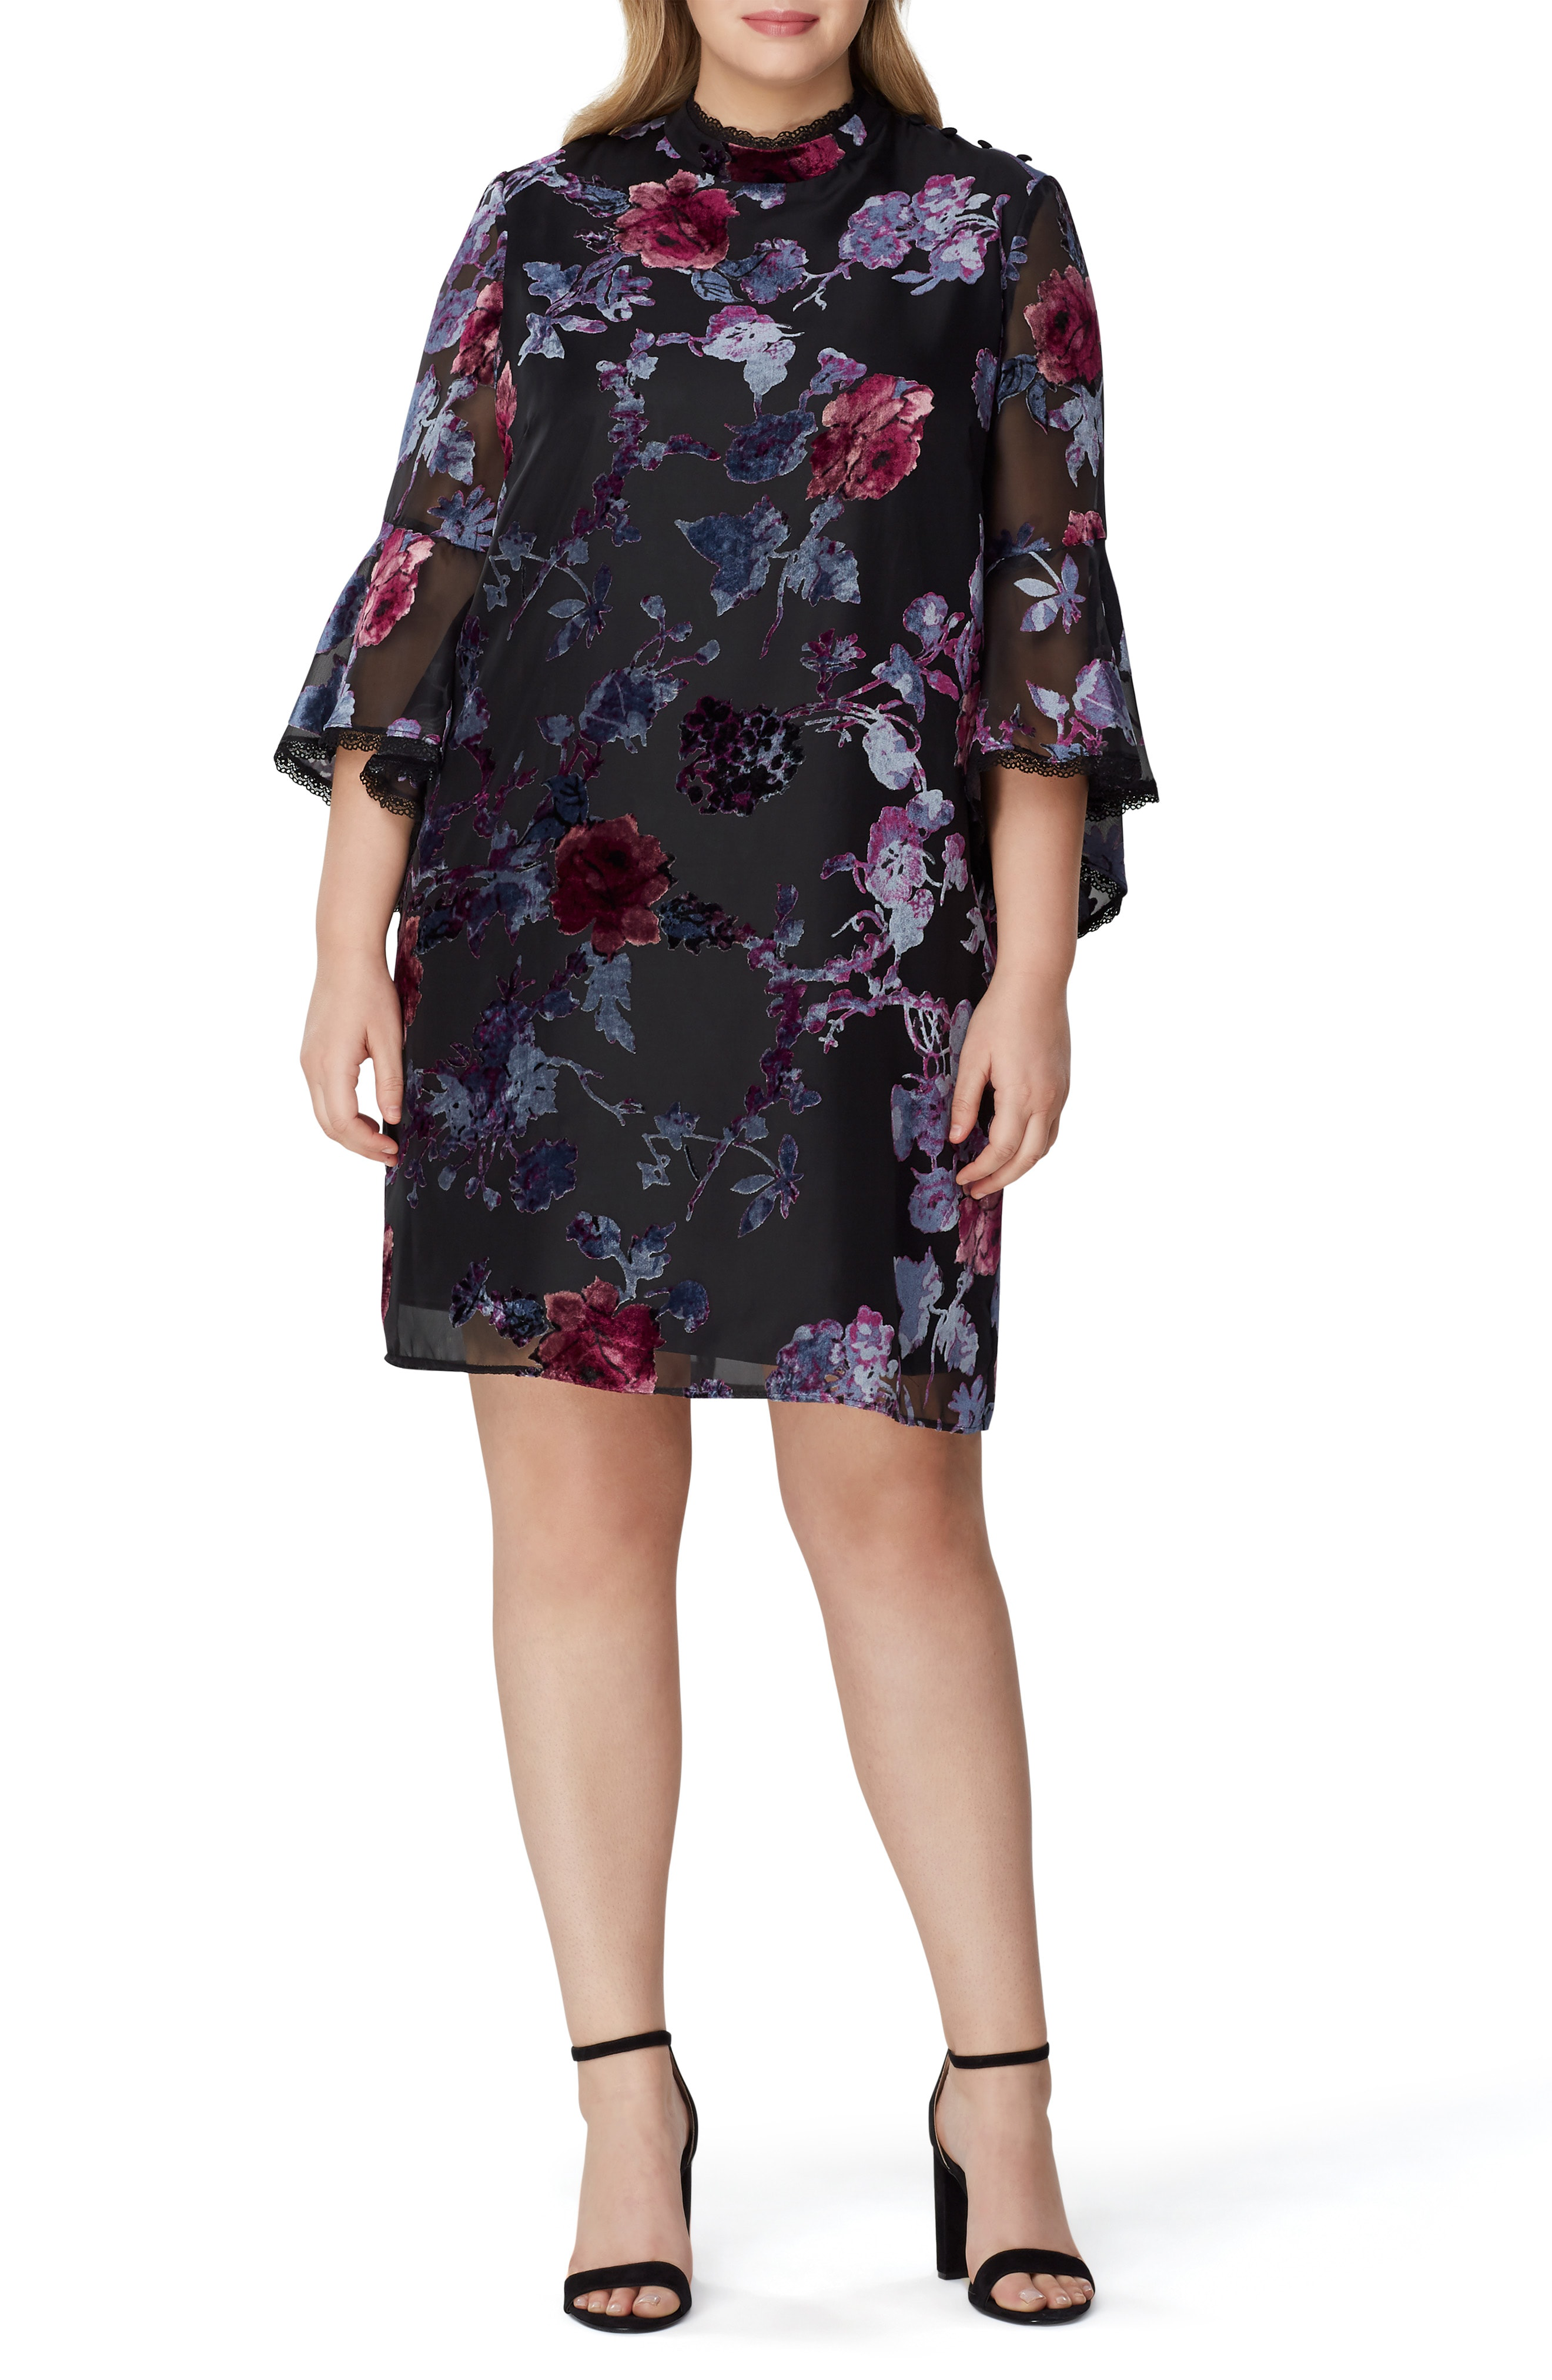 80f3f403f4e0 Tahari Floral Burnout Bell Sleeve Shift Dress In Black/ Lilac/ Rose ...